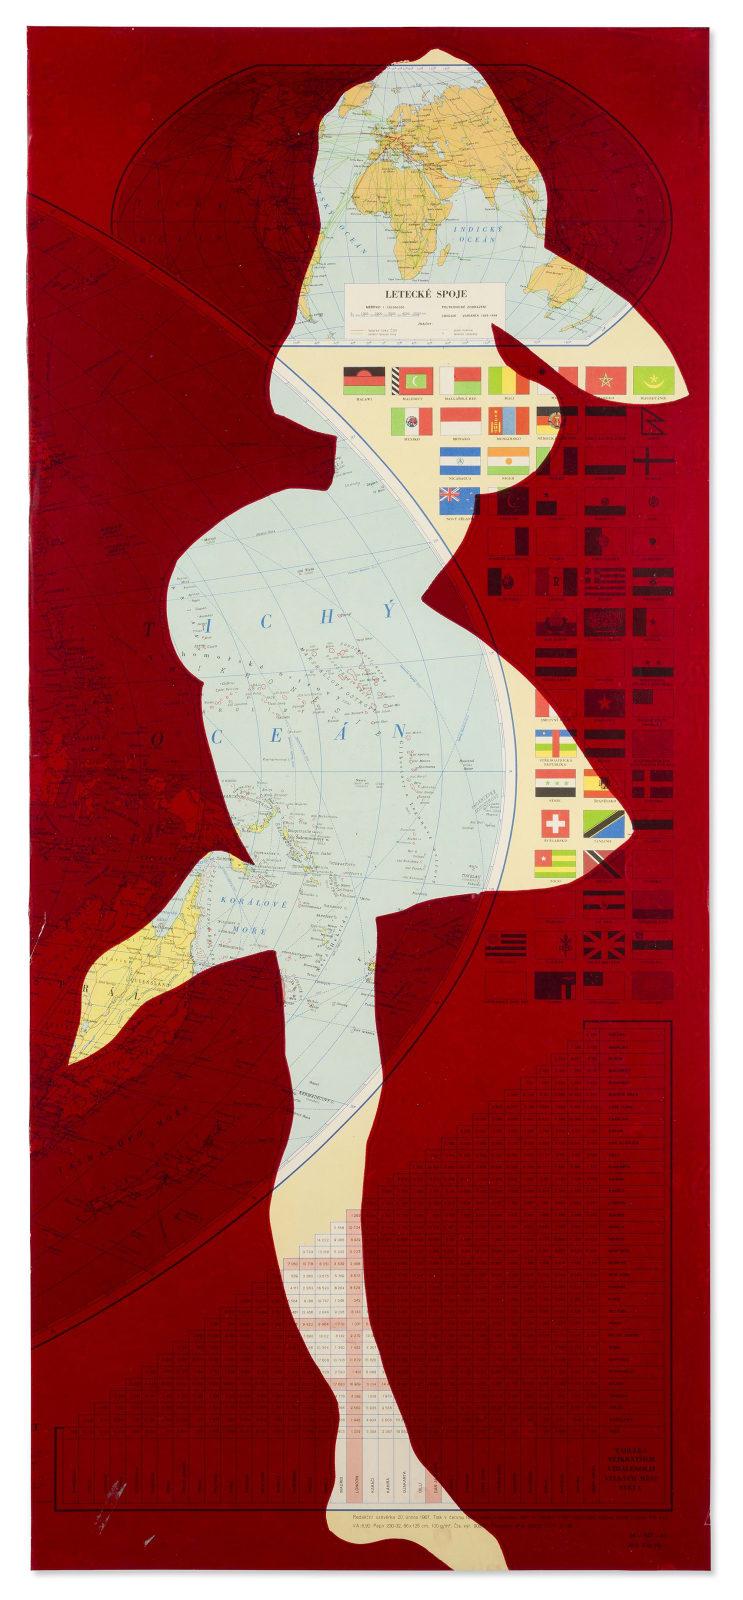 STANO FILKO, Map of the World (Woman), 1967